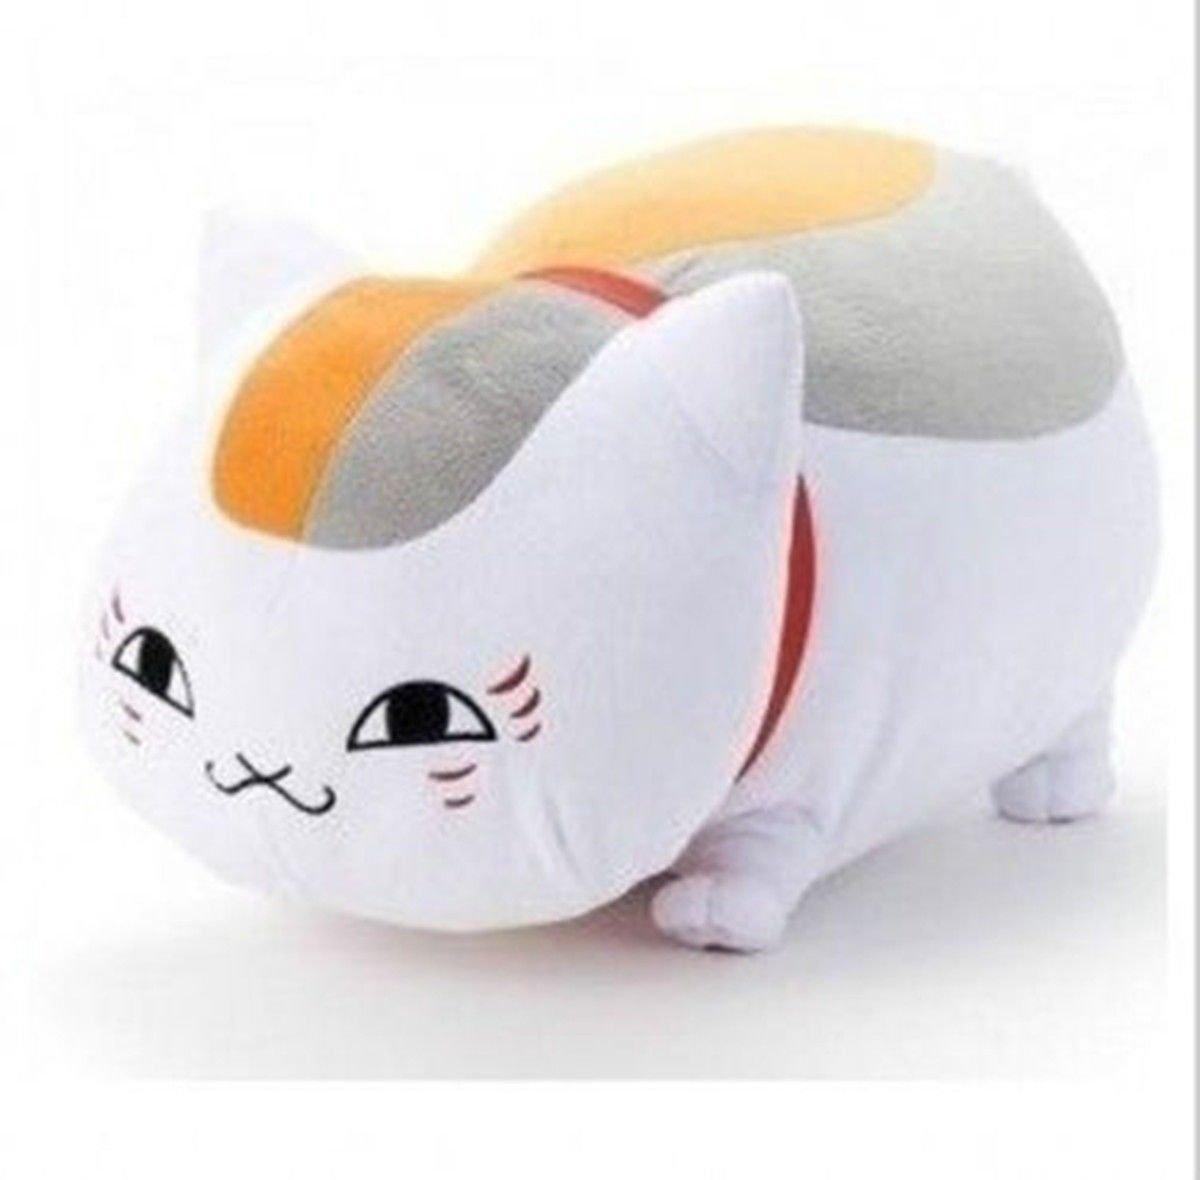 8Anime Natsume's Book of Friends Nyanko Sensei Yuujinchou Cat Plush Toy Dolls HiRudolph